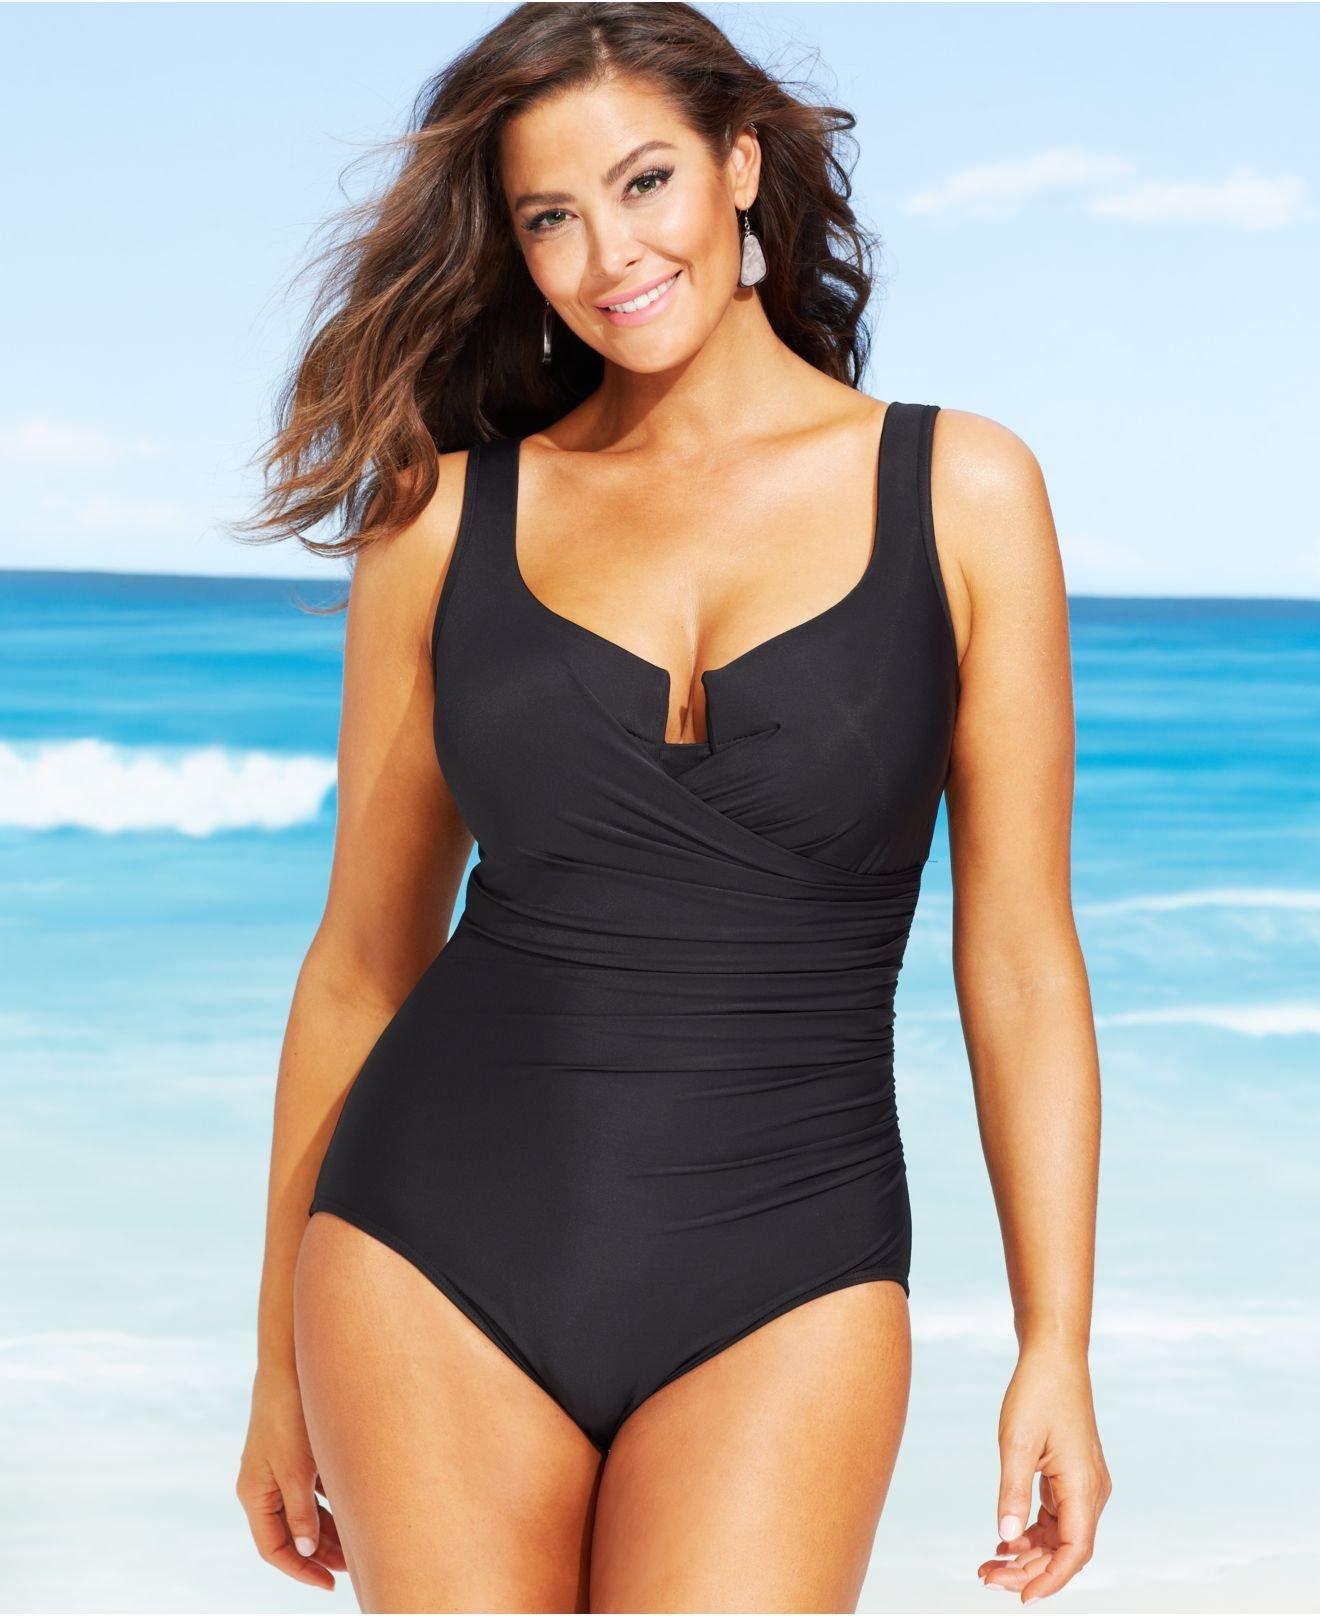 a9104f028e051 Lyst - Miraclesuit Plus Size Escape One-Piece Swimsuit in Black